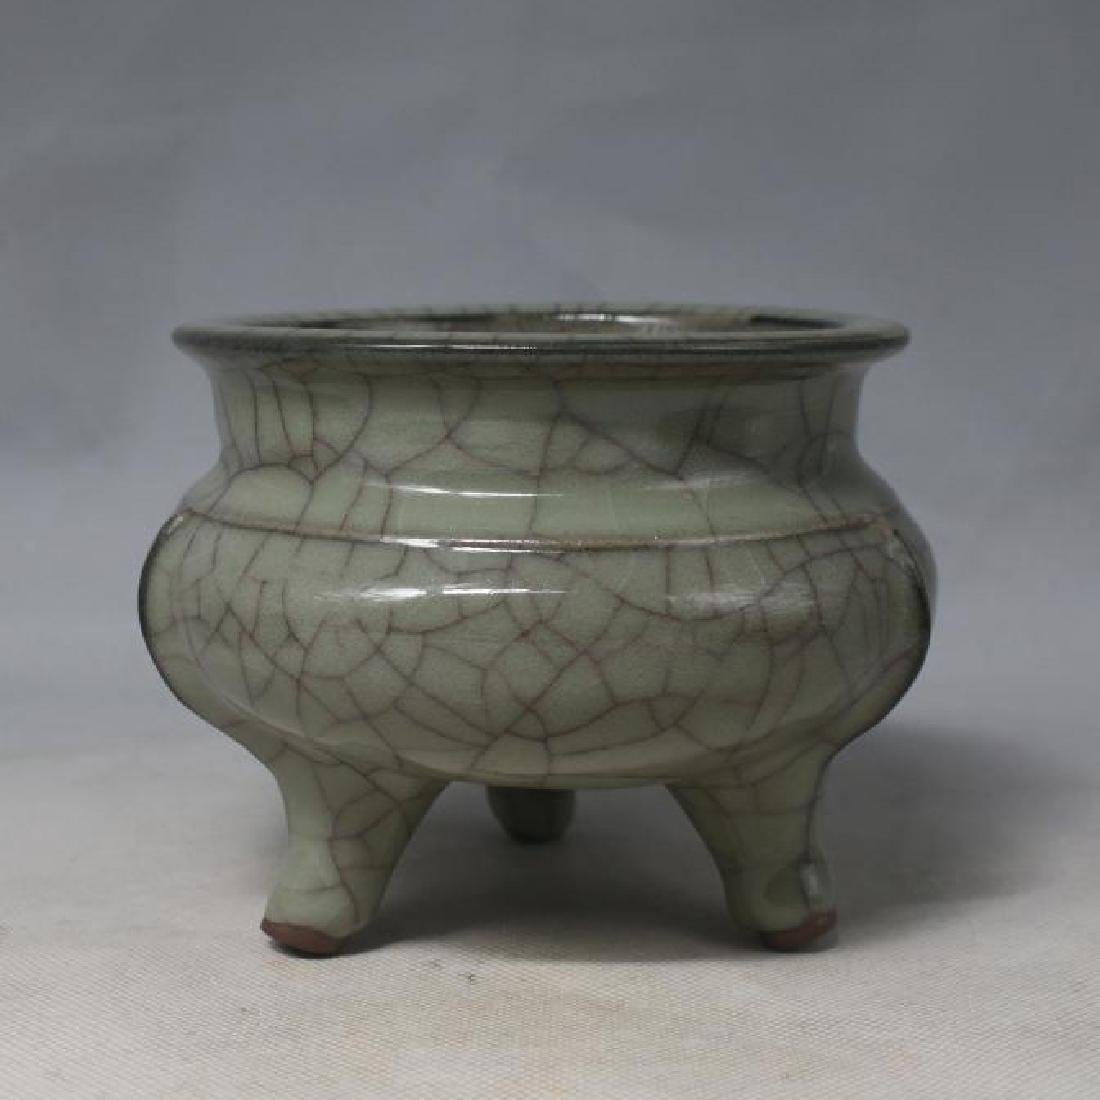 Chinese Guan Ware Tripod Censer